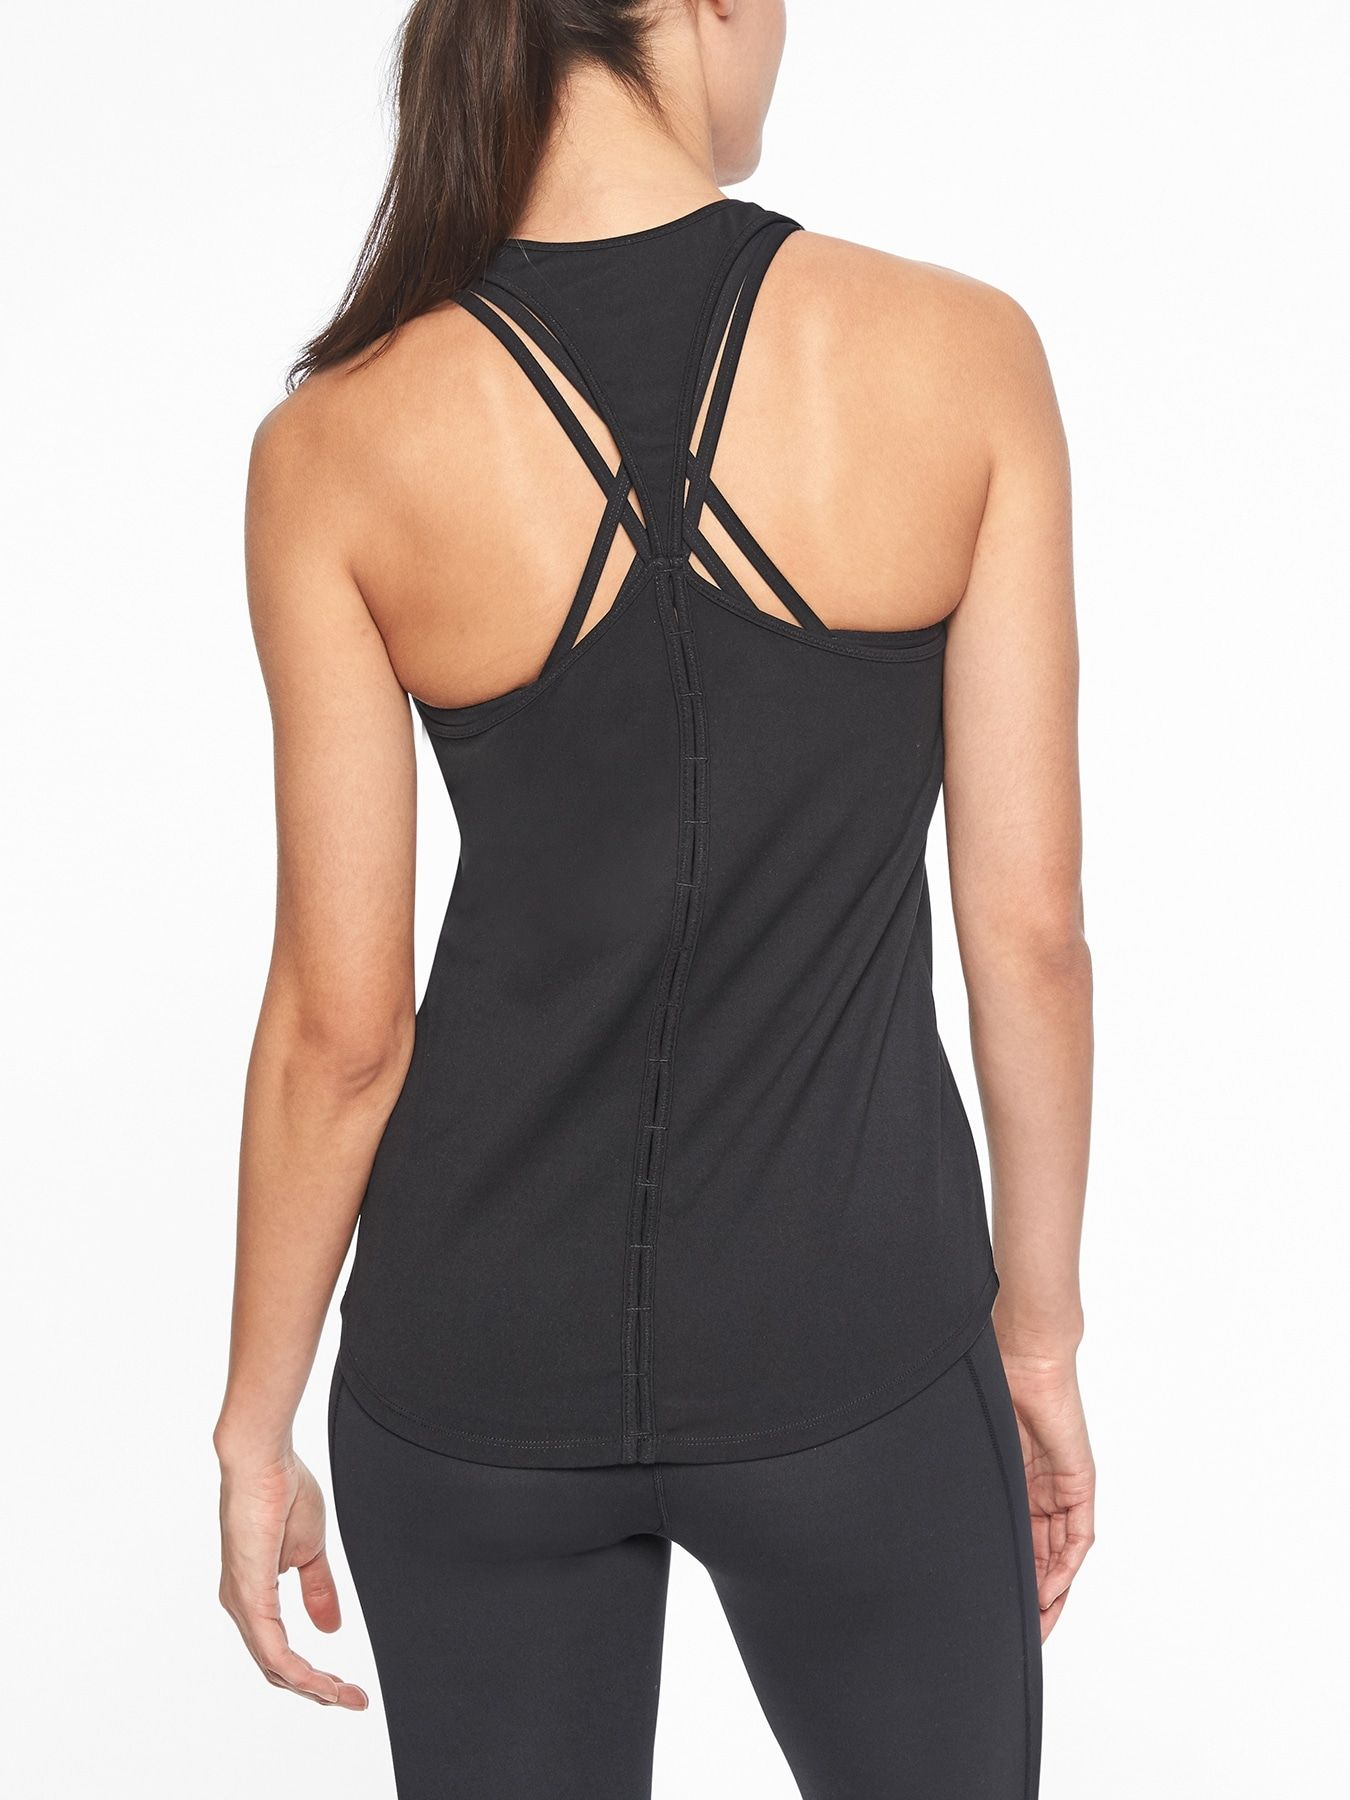 product photo Athletic tank tops, Tennis fashion, Fashion